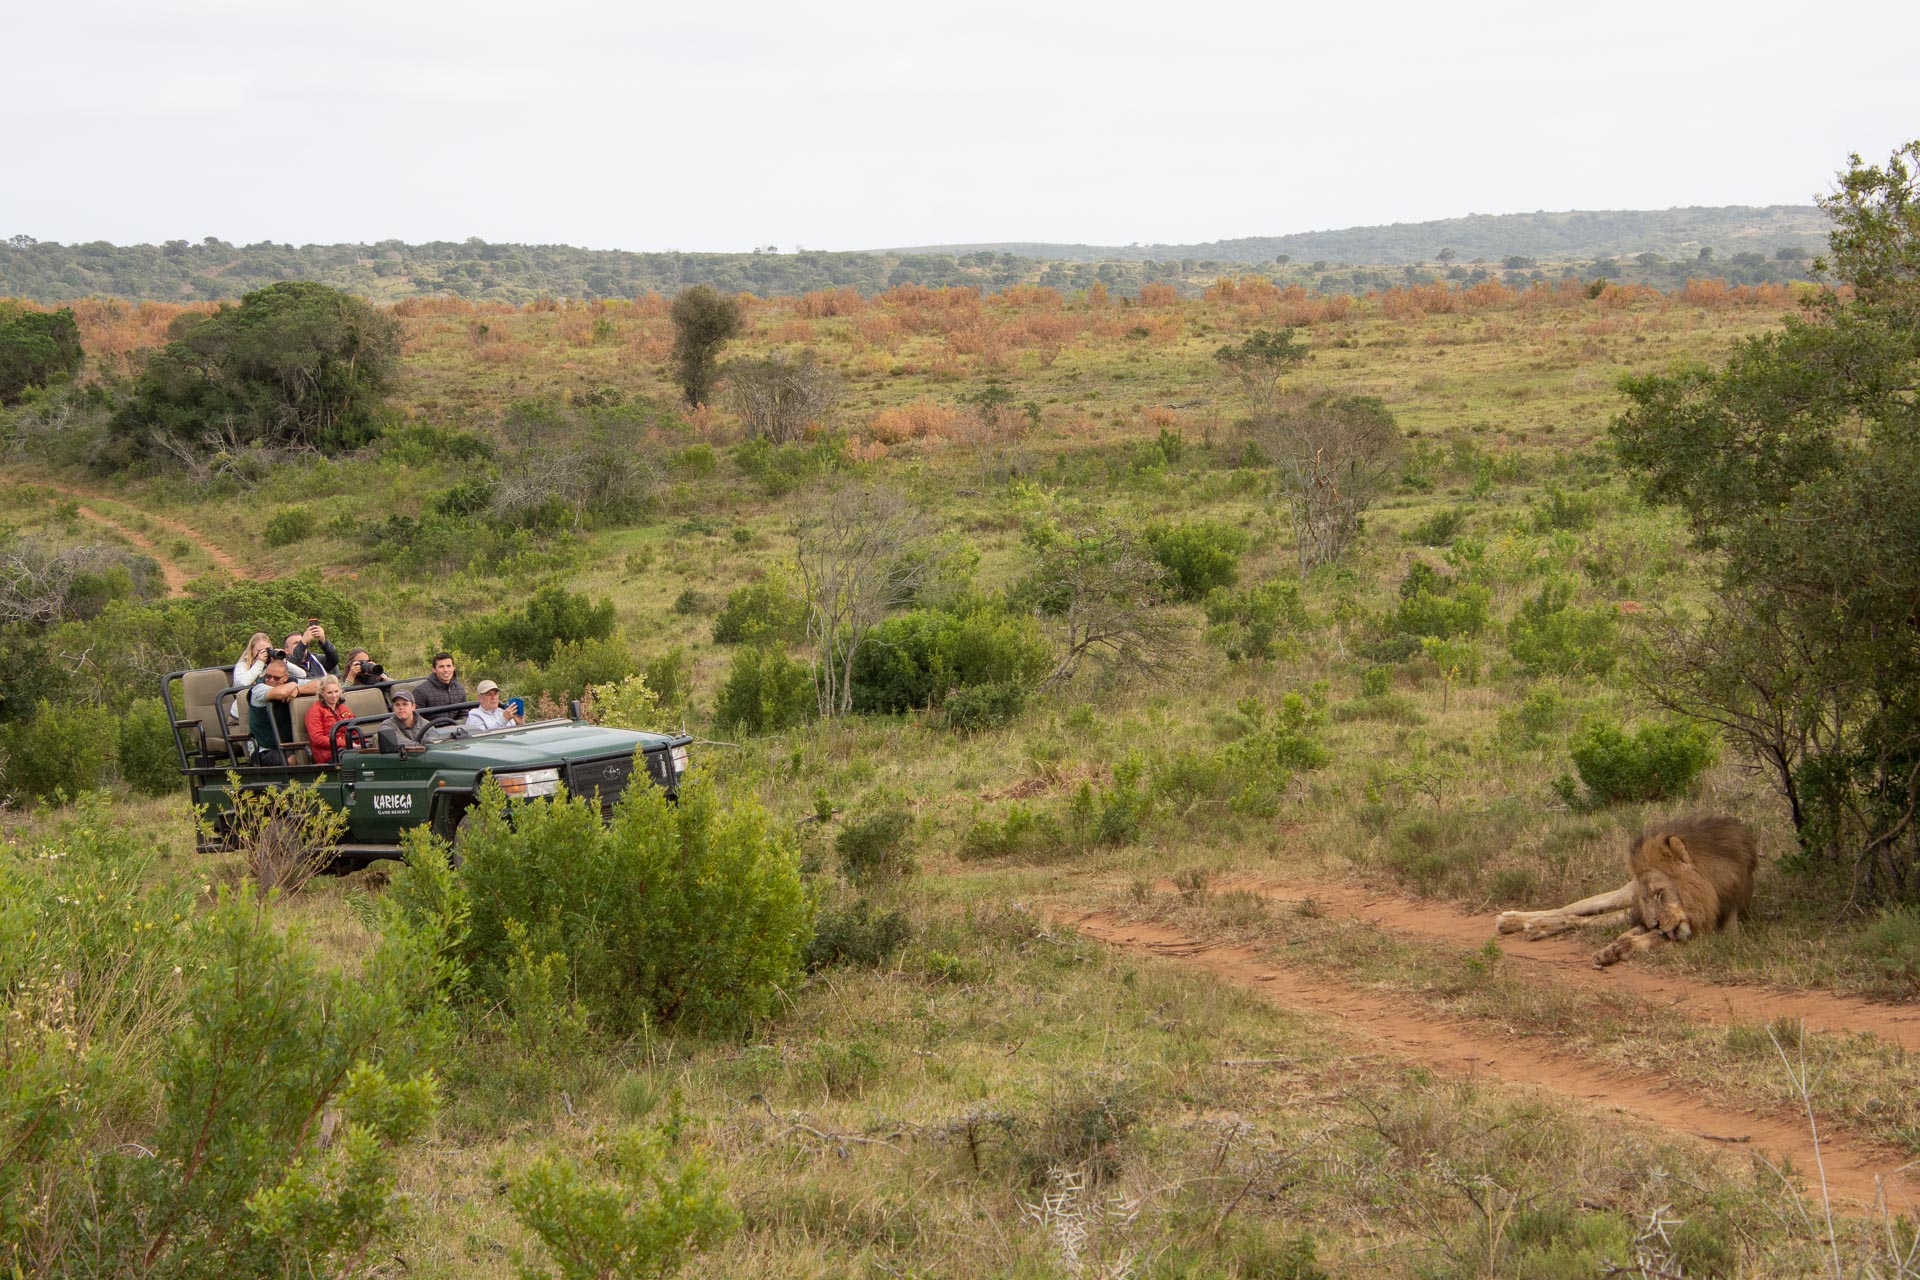 Kariega-Suedafrika-Globetrotter-Select-36